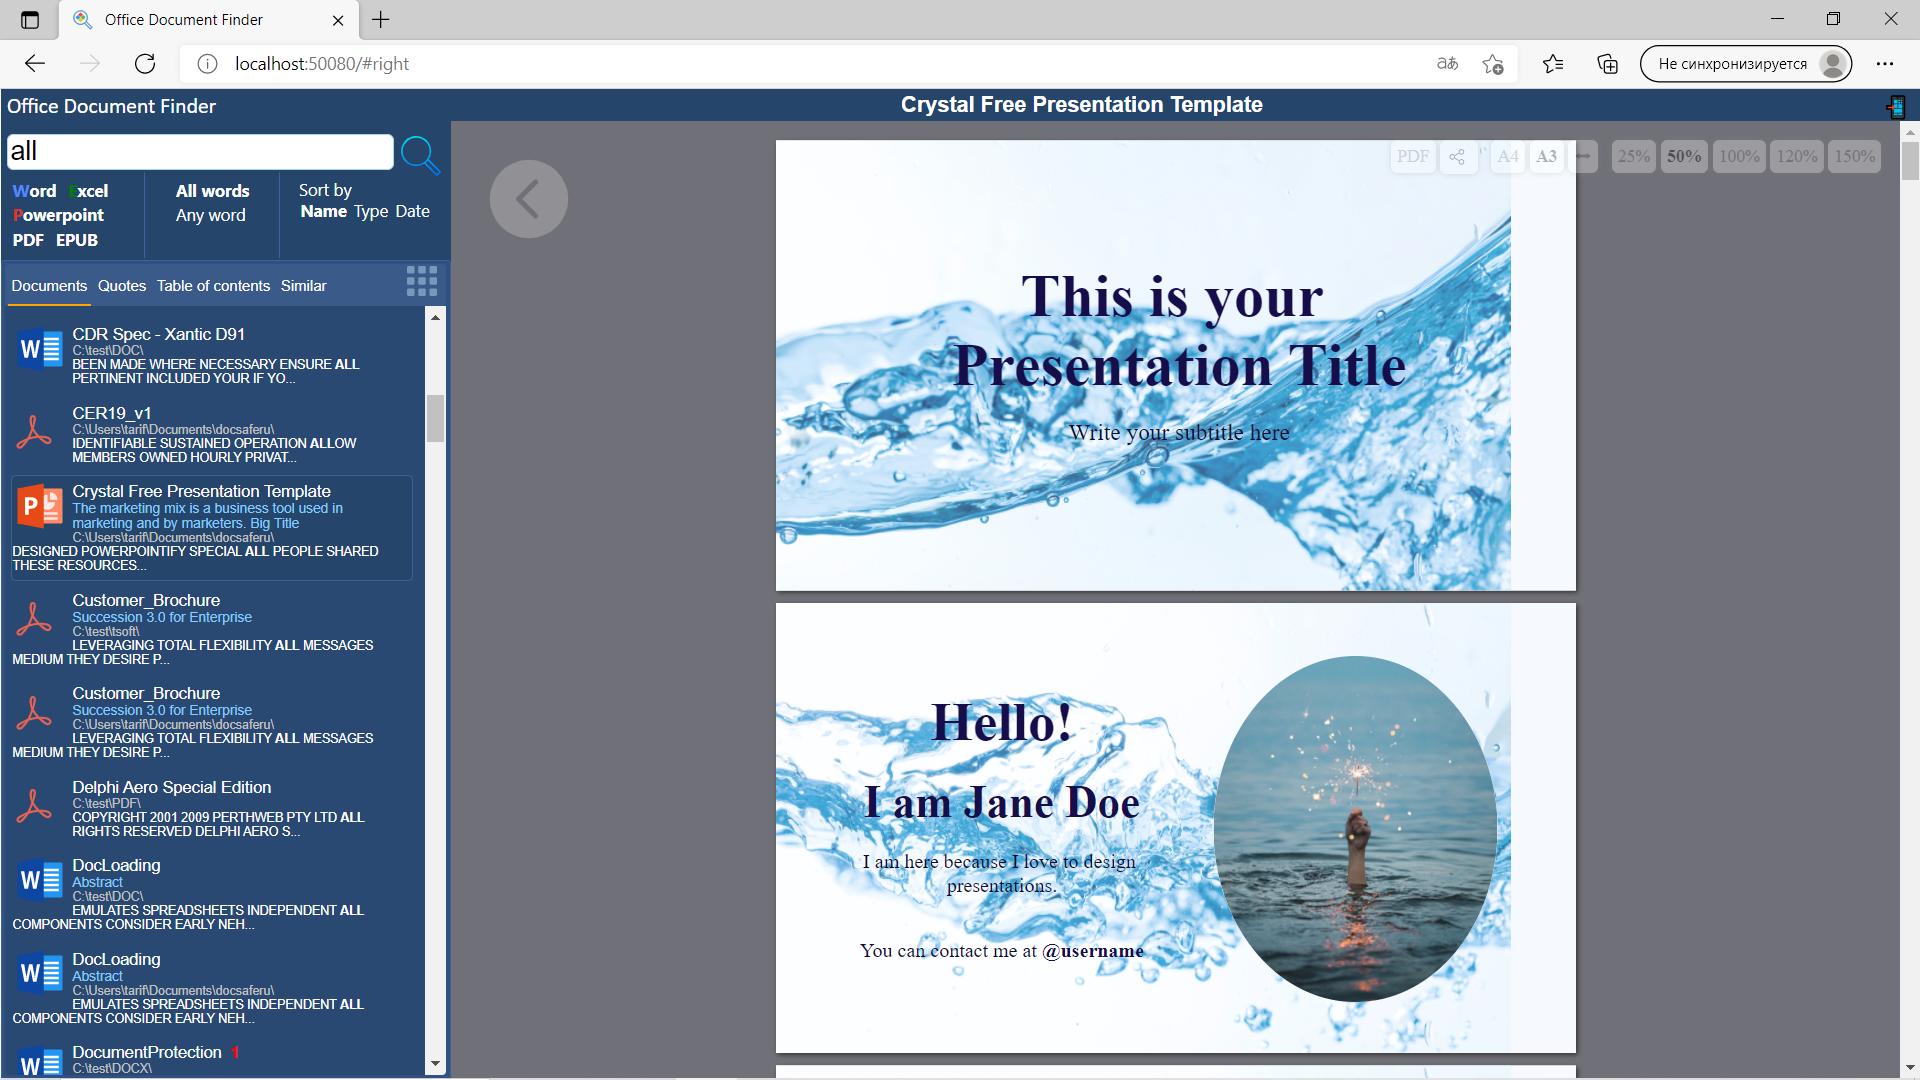 Office Document Finder Screenshot